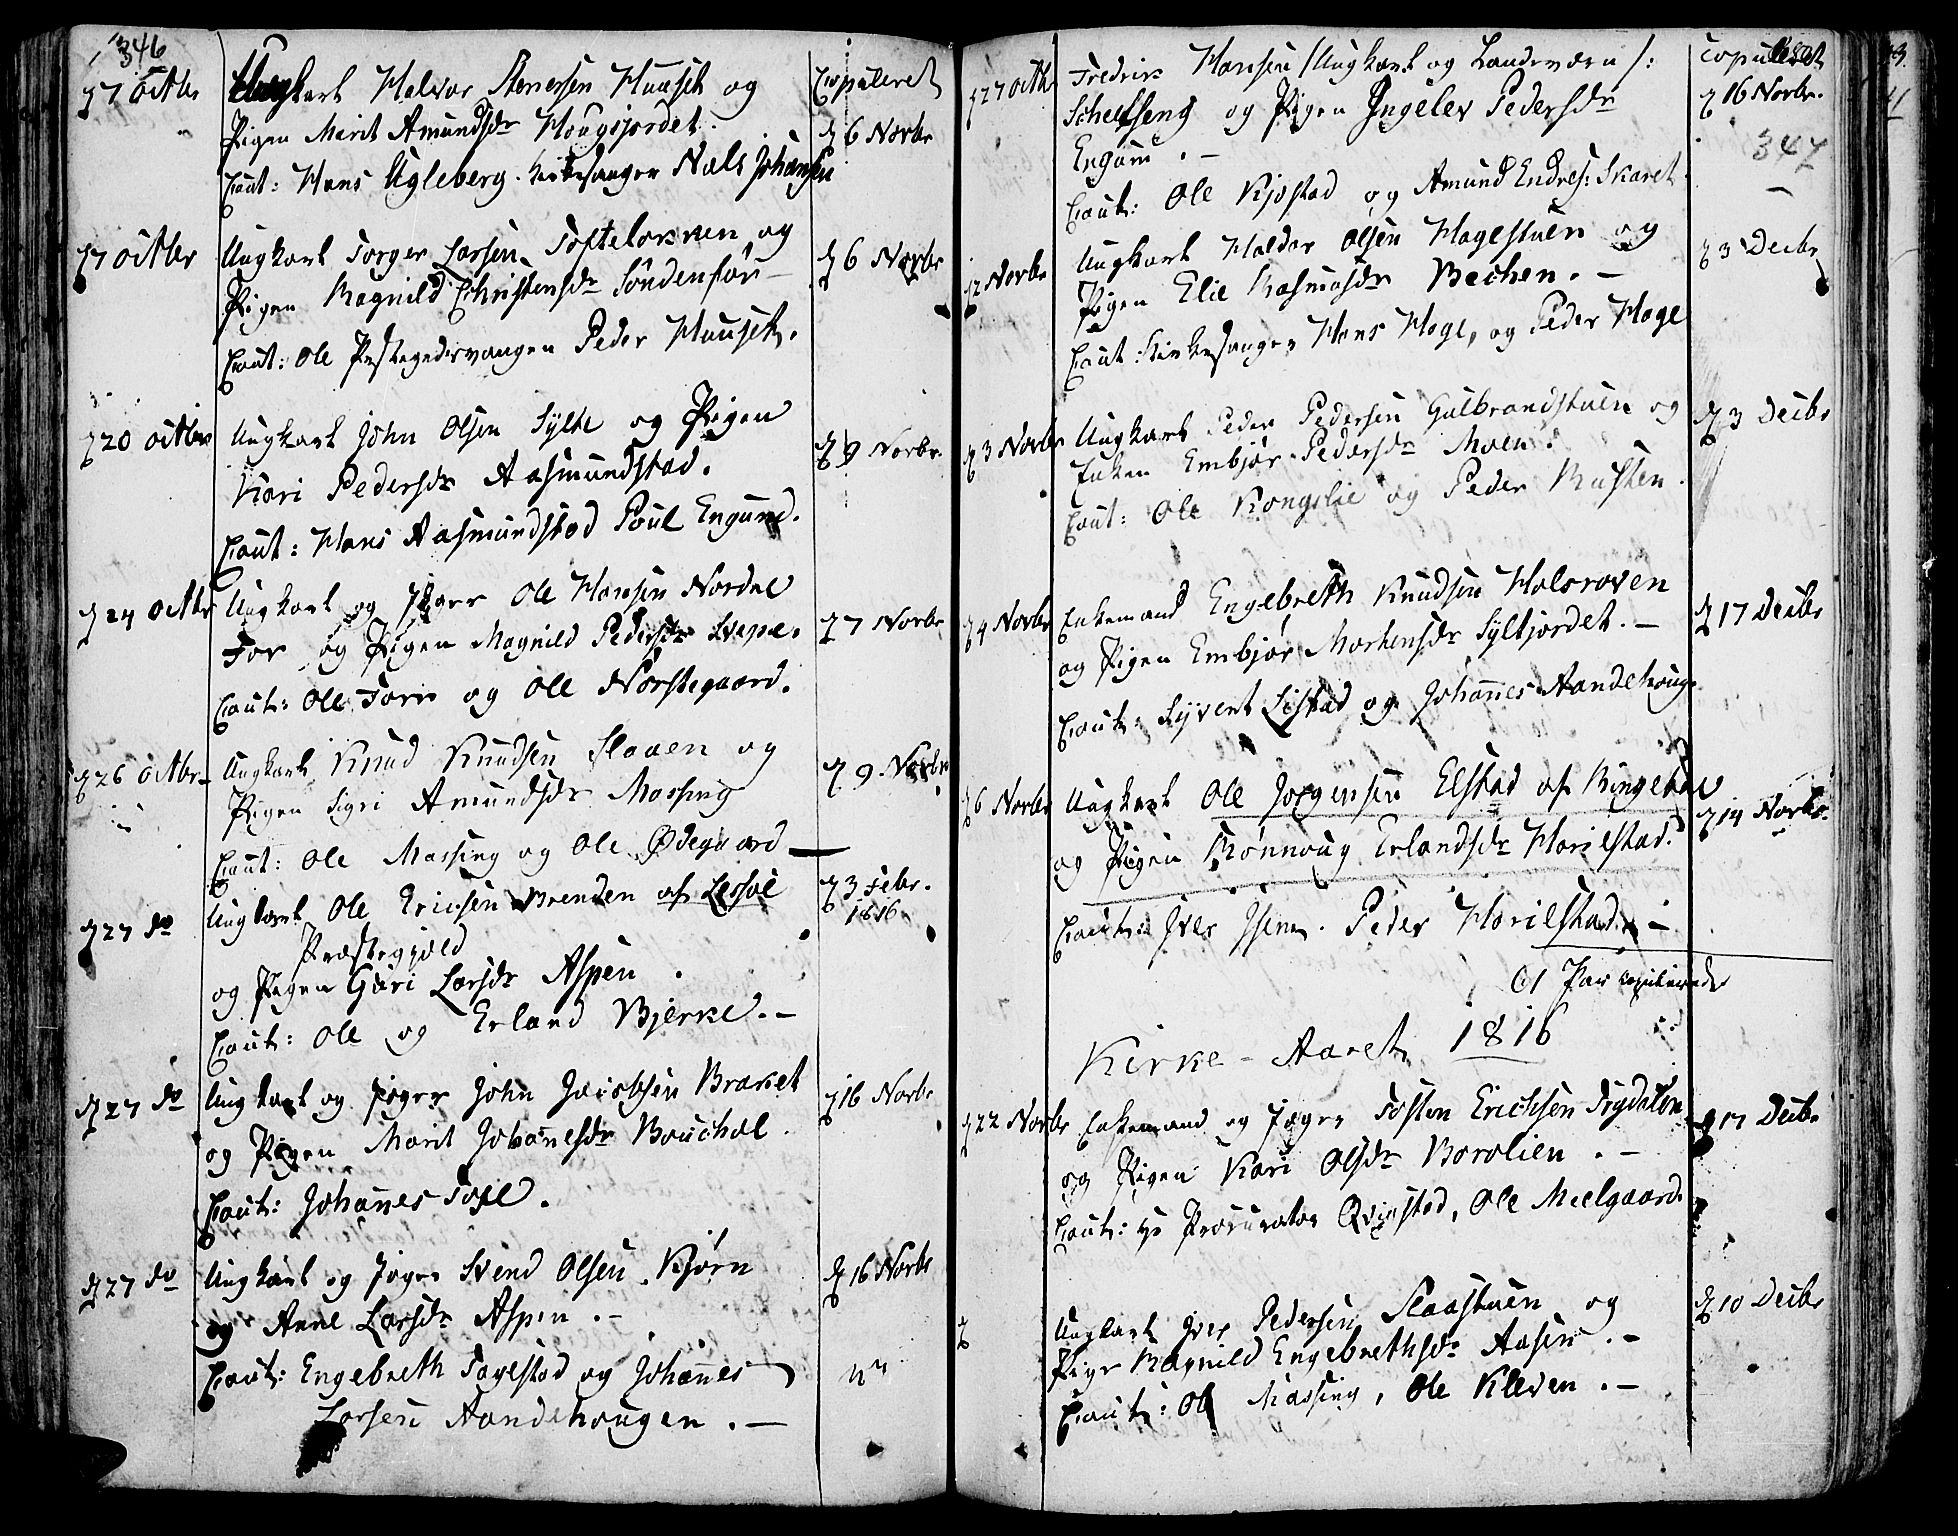 SAH, Fron prestekontor, H/Ha/Haa/L0001: Ministerialbok nr. 1, 1799-1816, s. 346-347